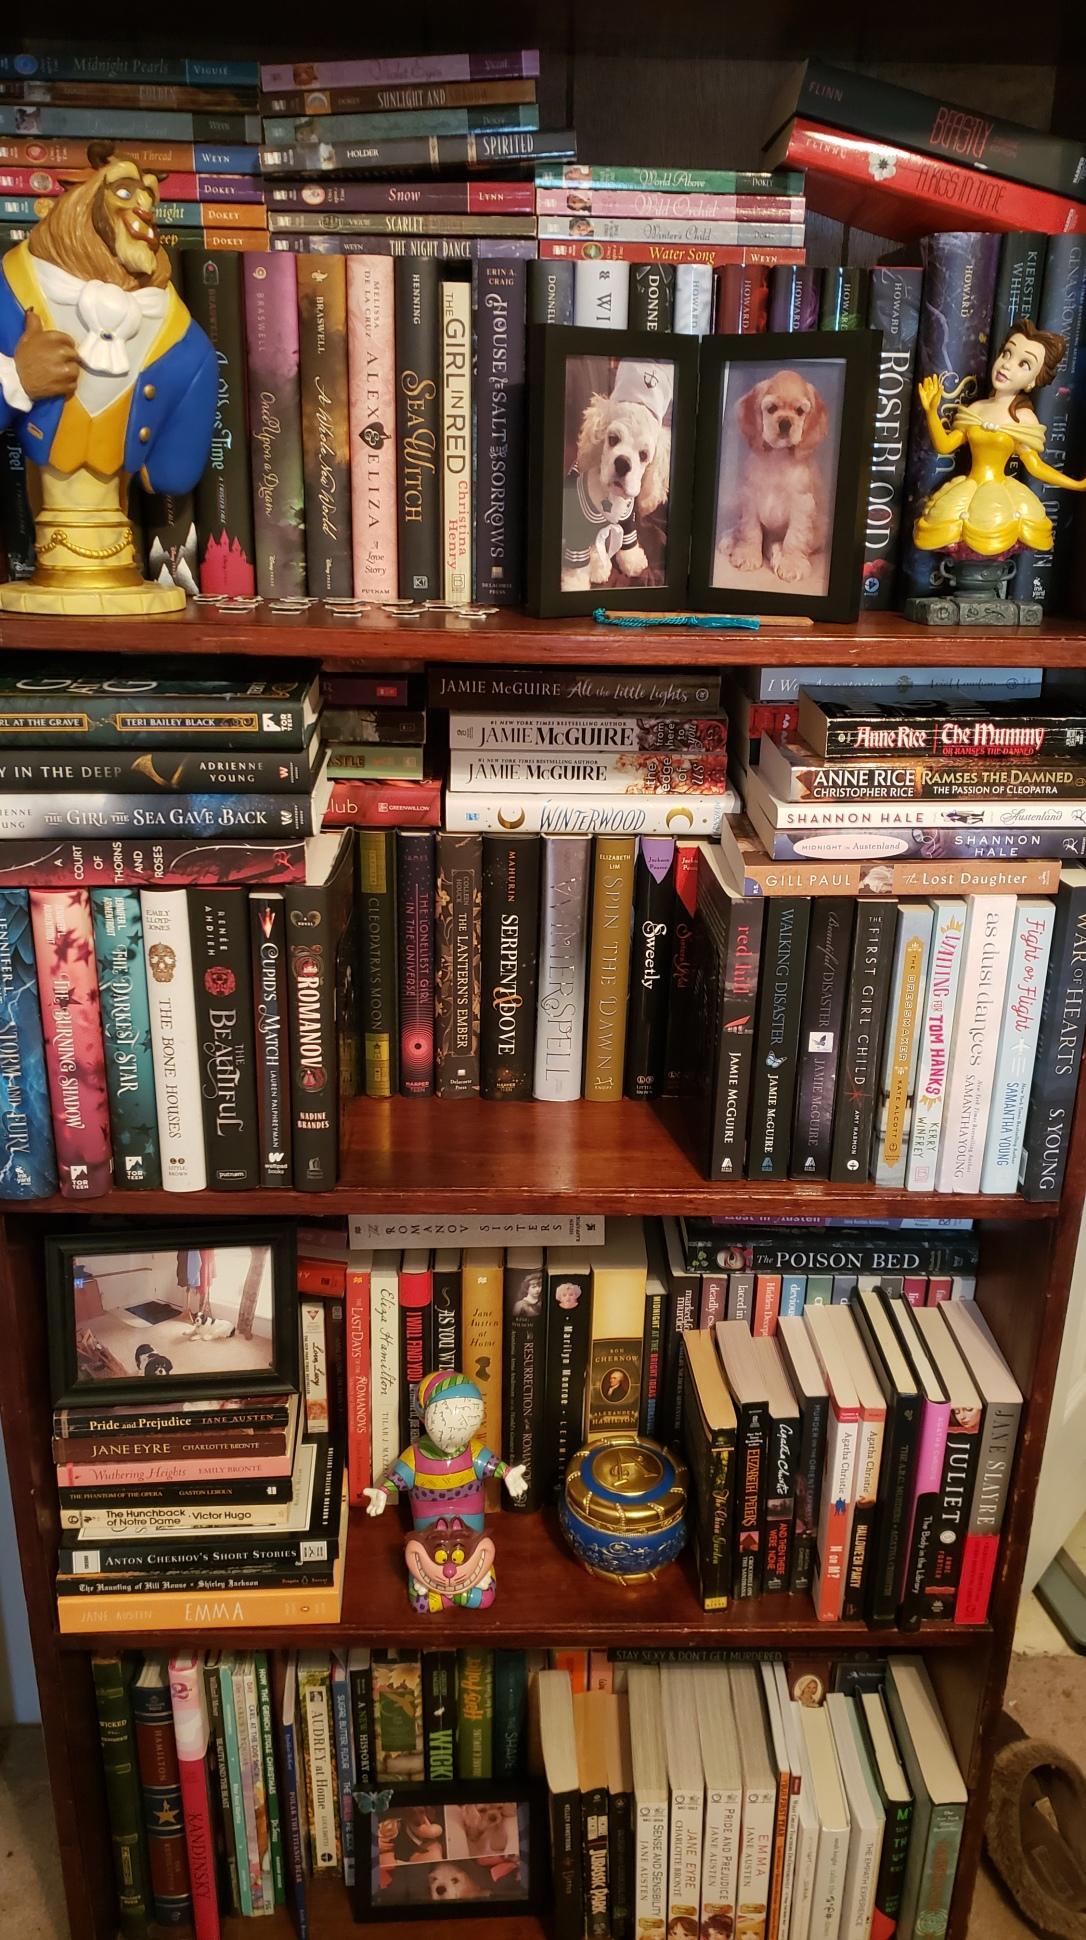 Genre Bookshelf